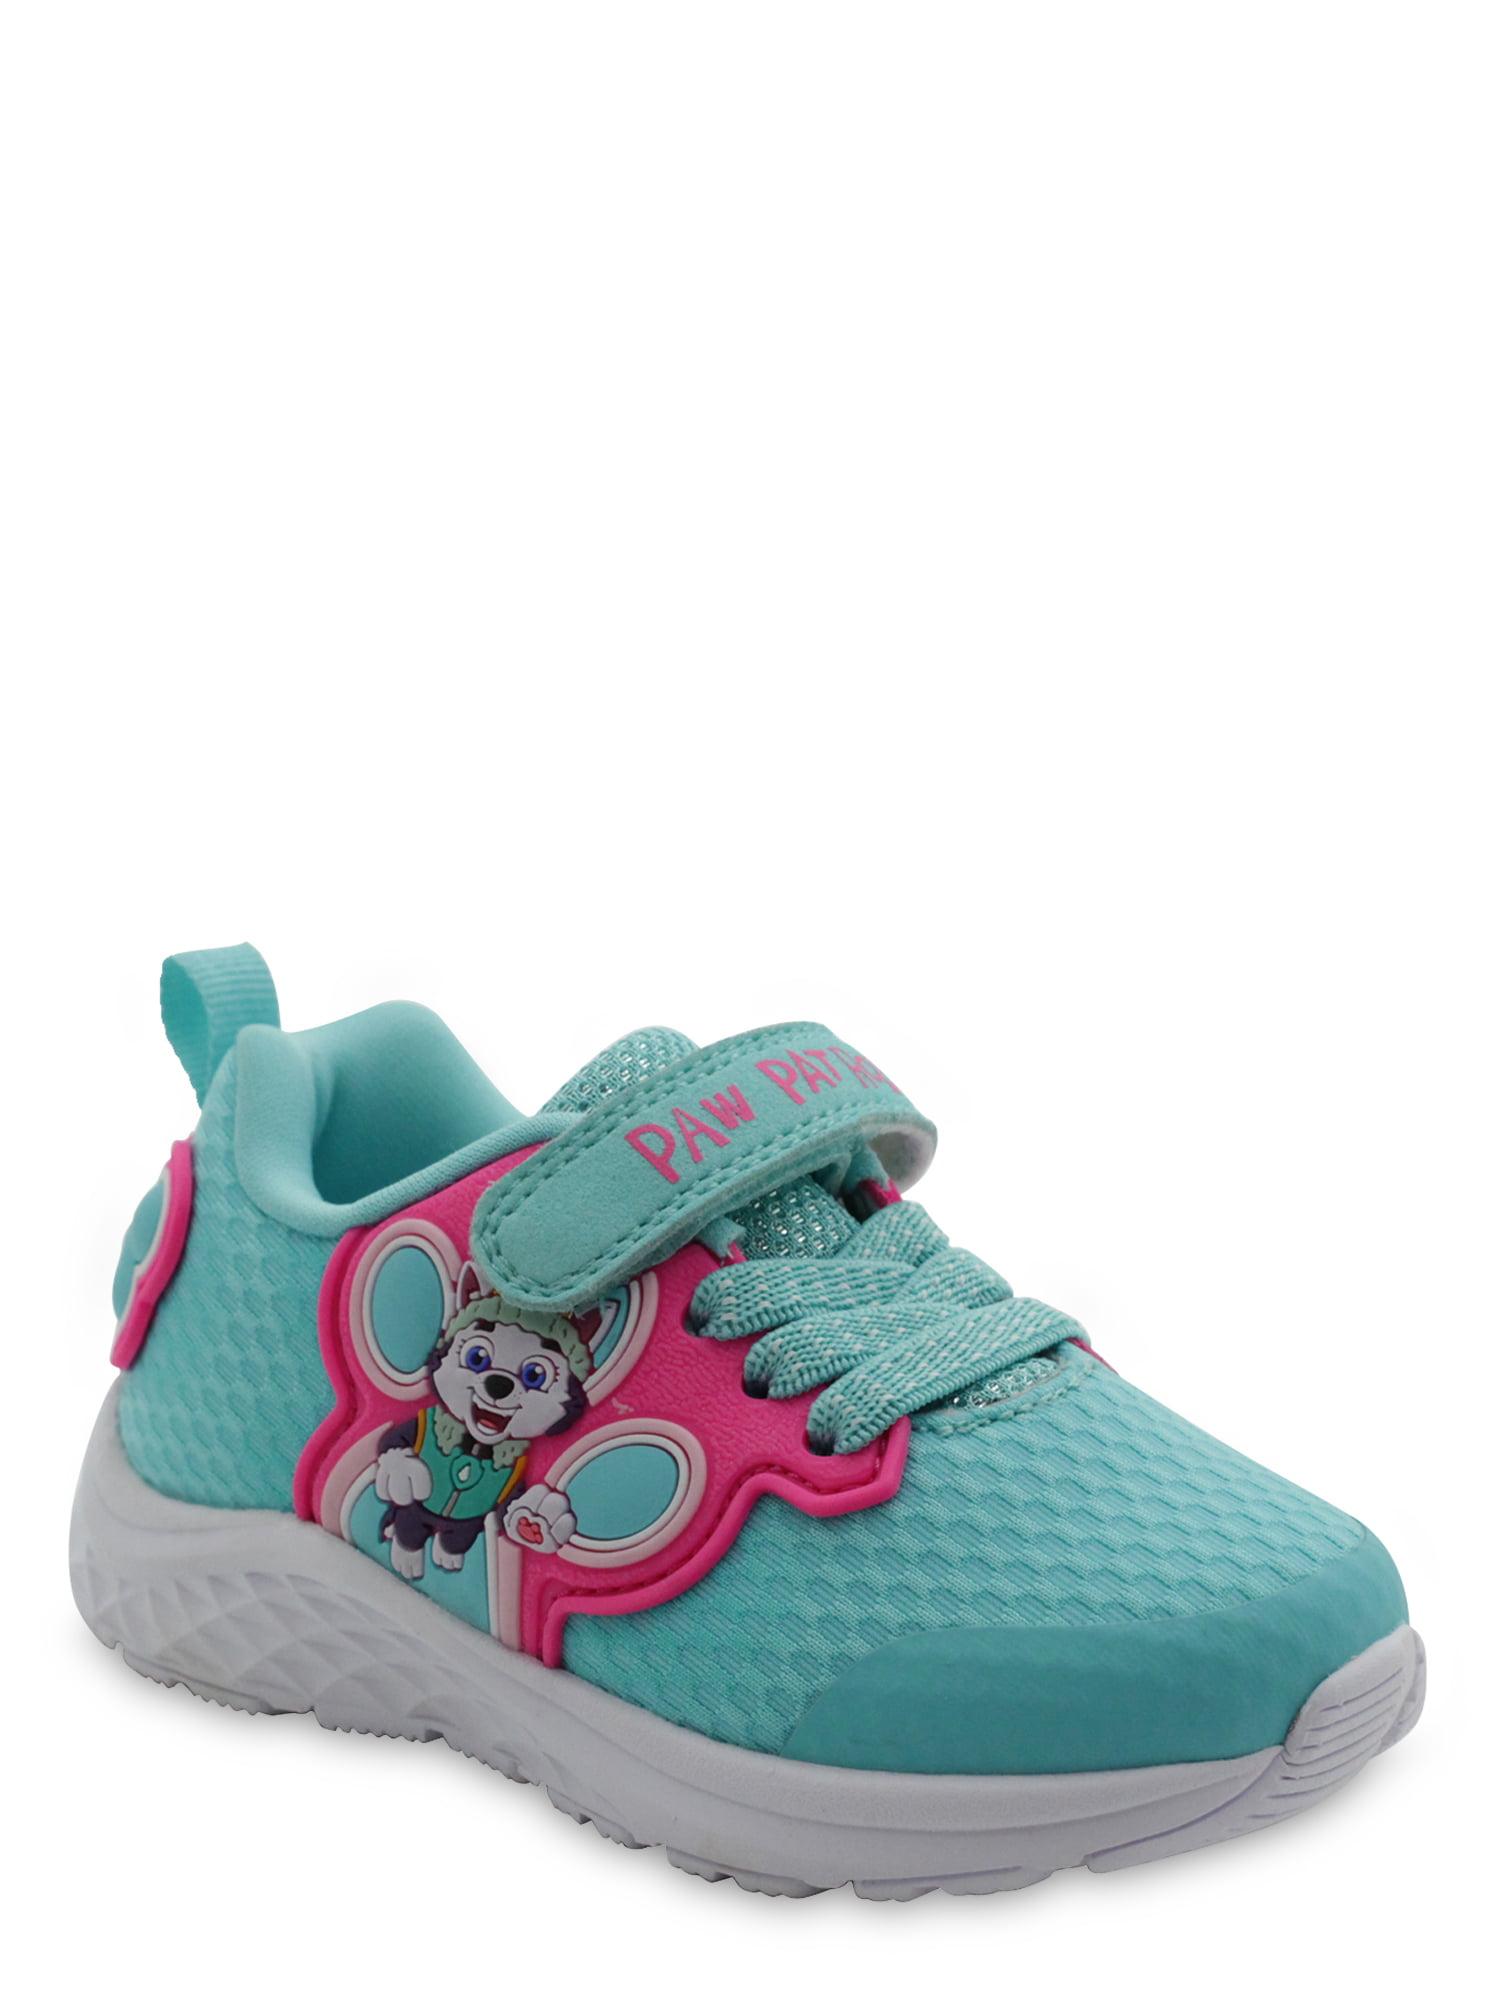 PAW Patrol Shoes : Apparel - Walmart